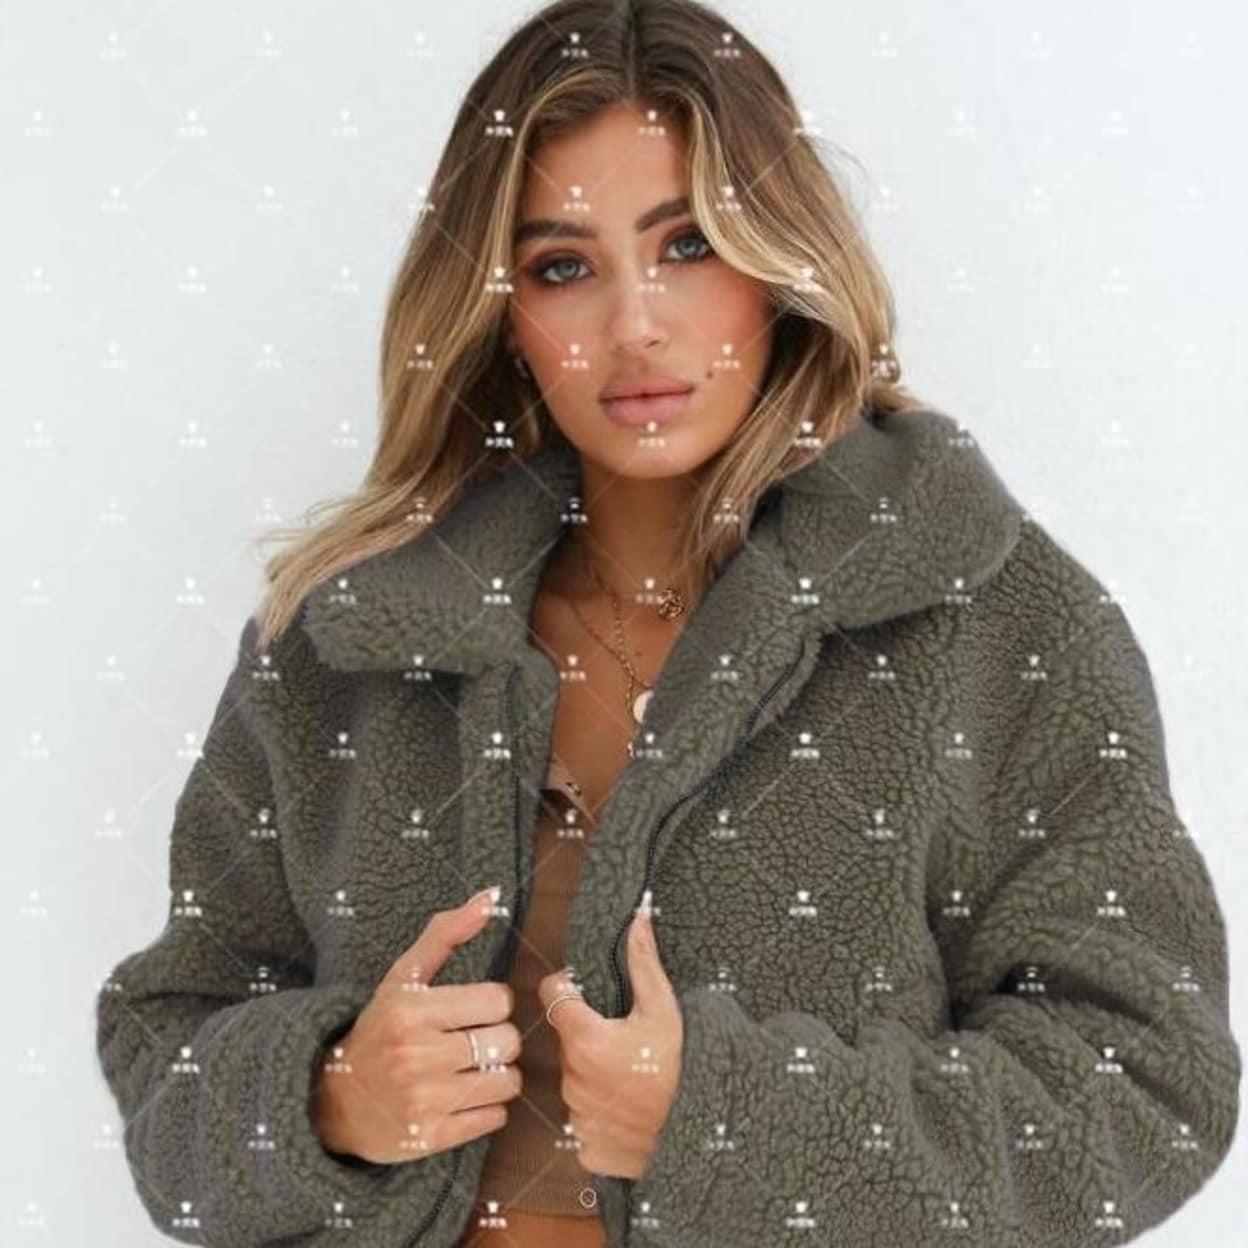 HOTLOOX Women Winter Lapel Fuzzy Fleece Jackets Oversized Zipper Teddy Coats S-XXL